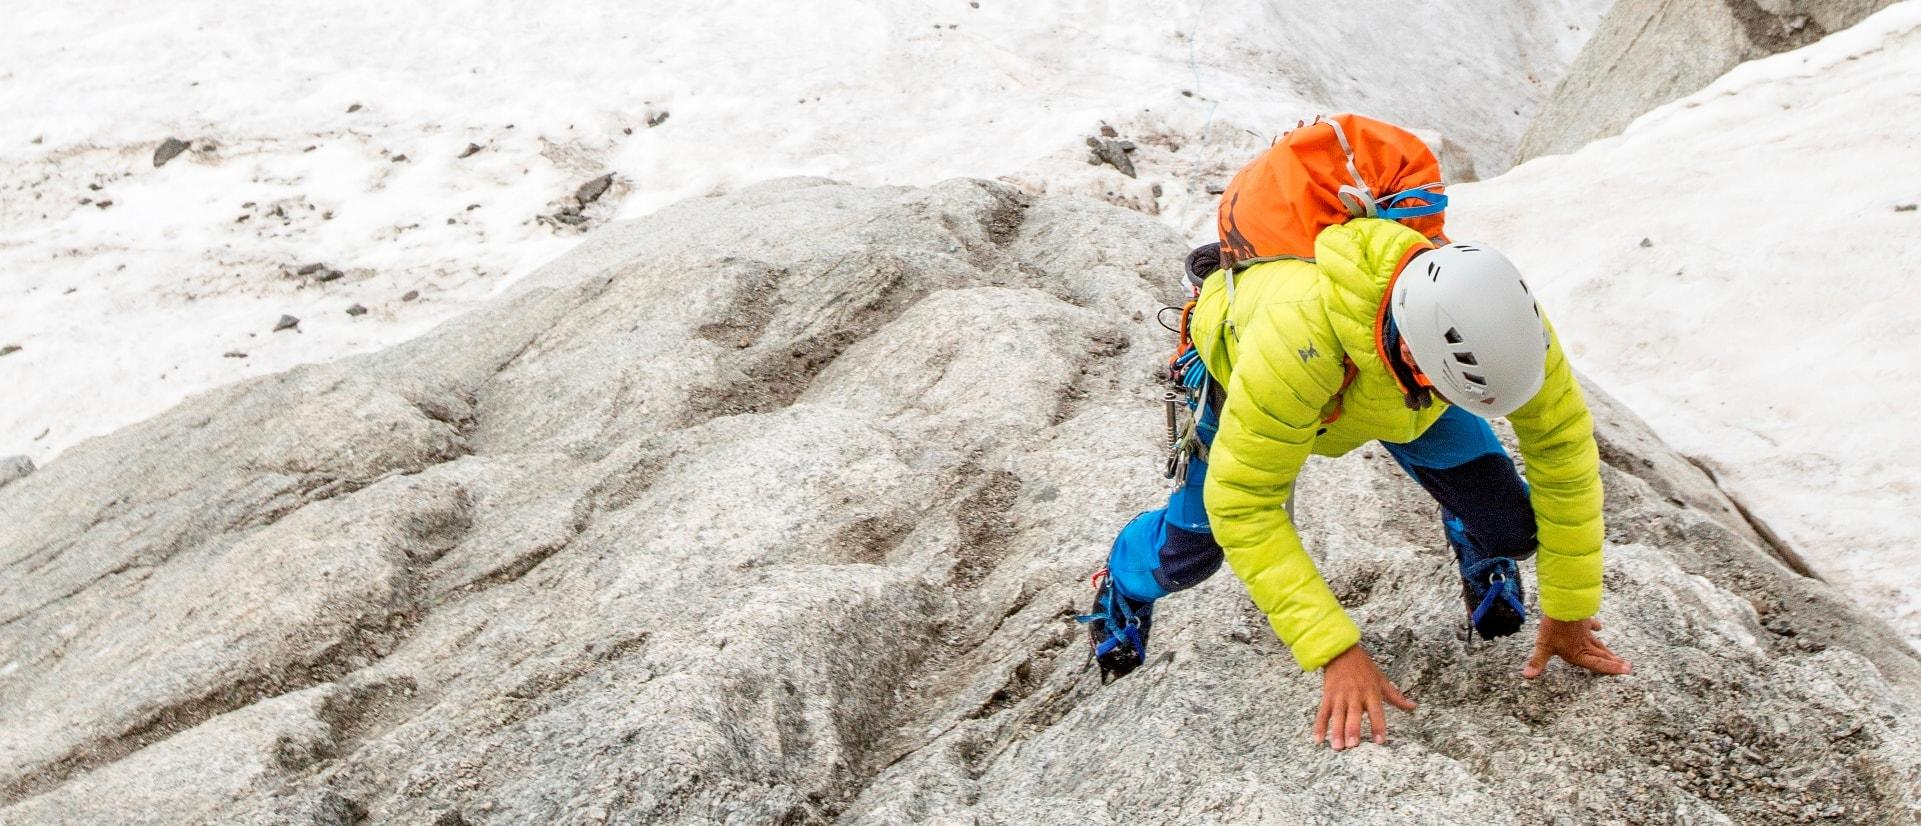 How to choose a climbing helmet?